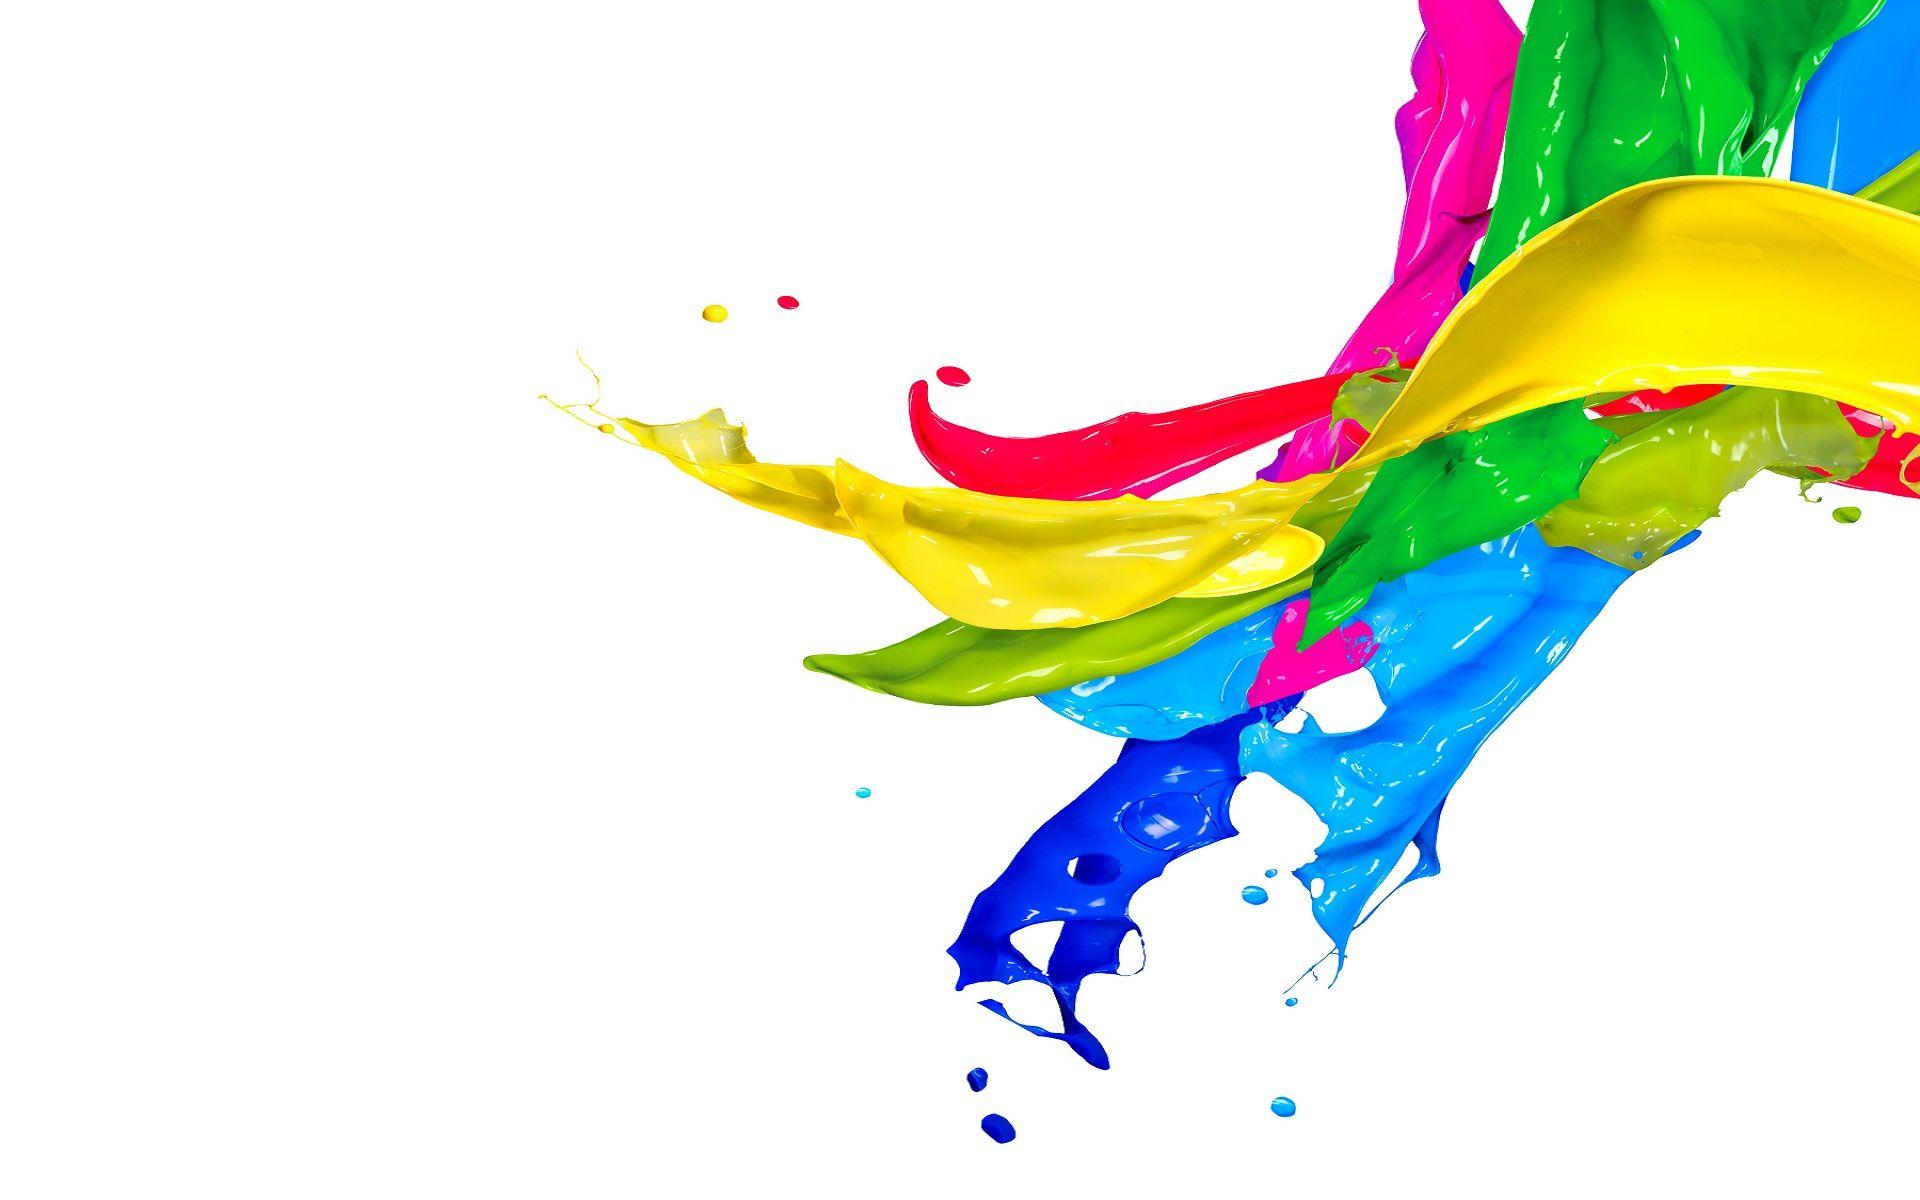 Paint splatter colorful. Splash wallpaper art painting